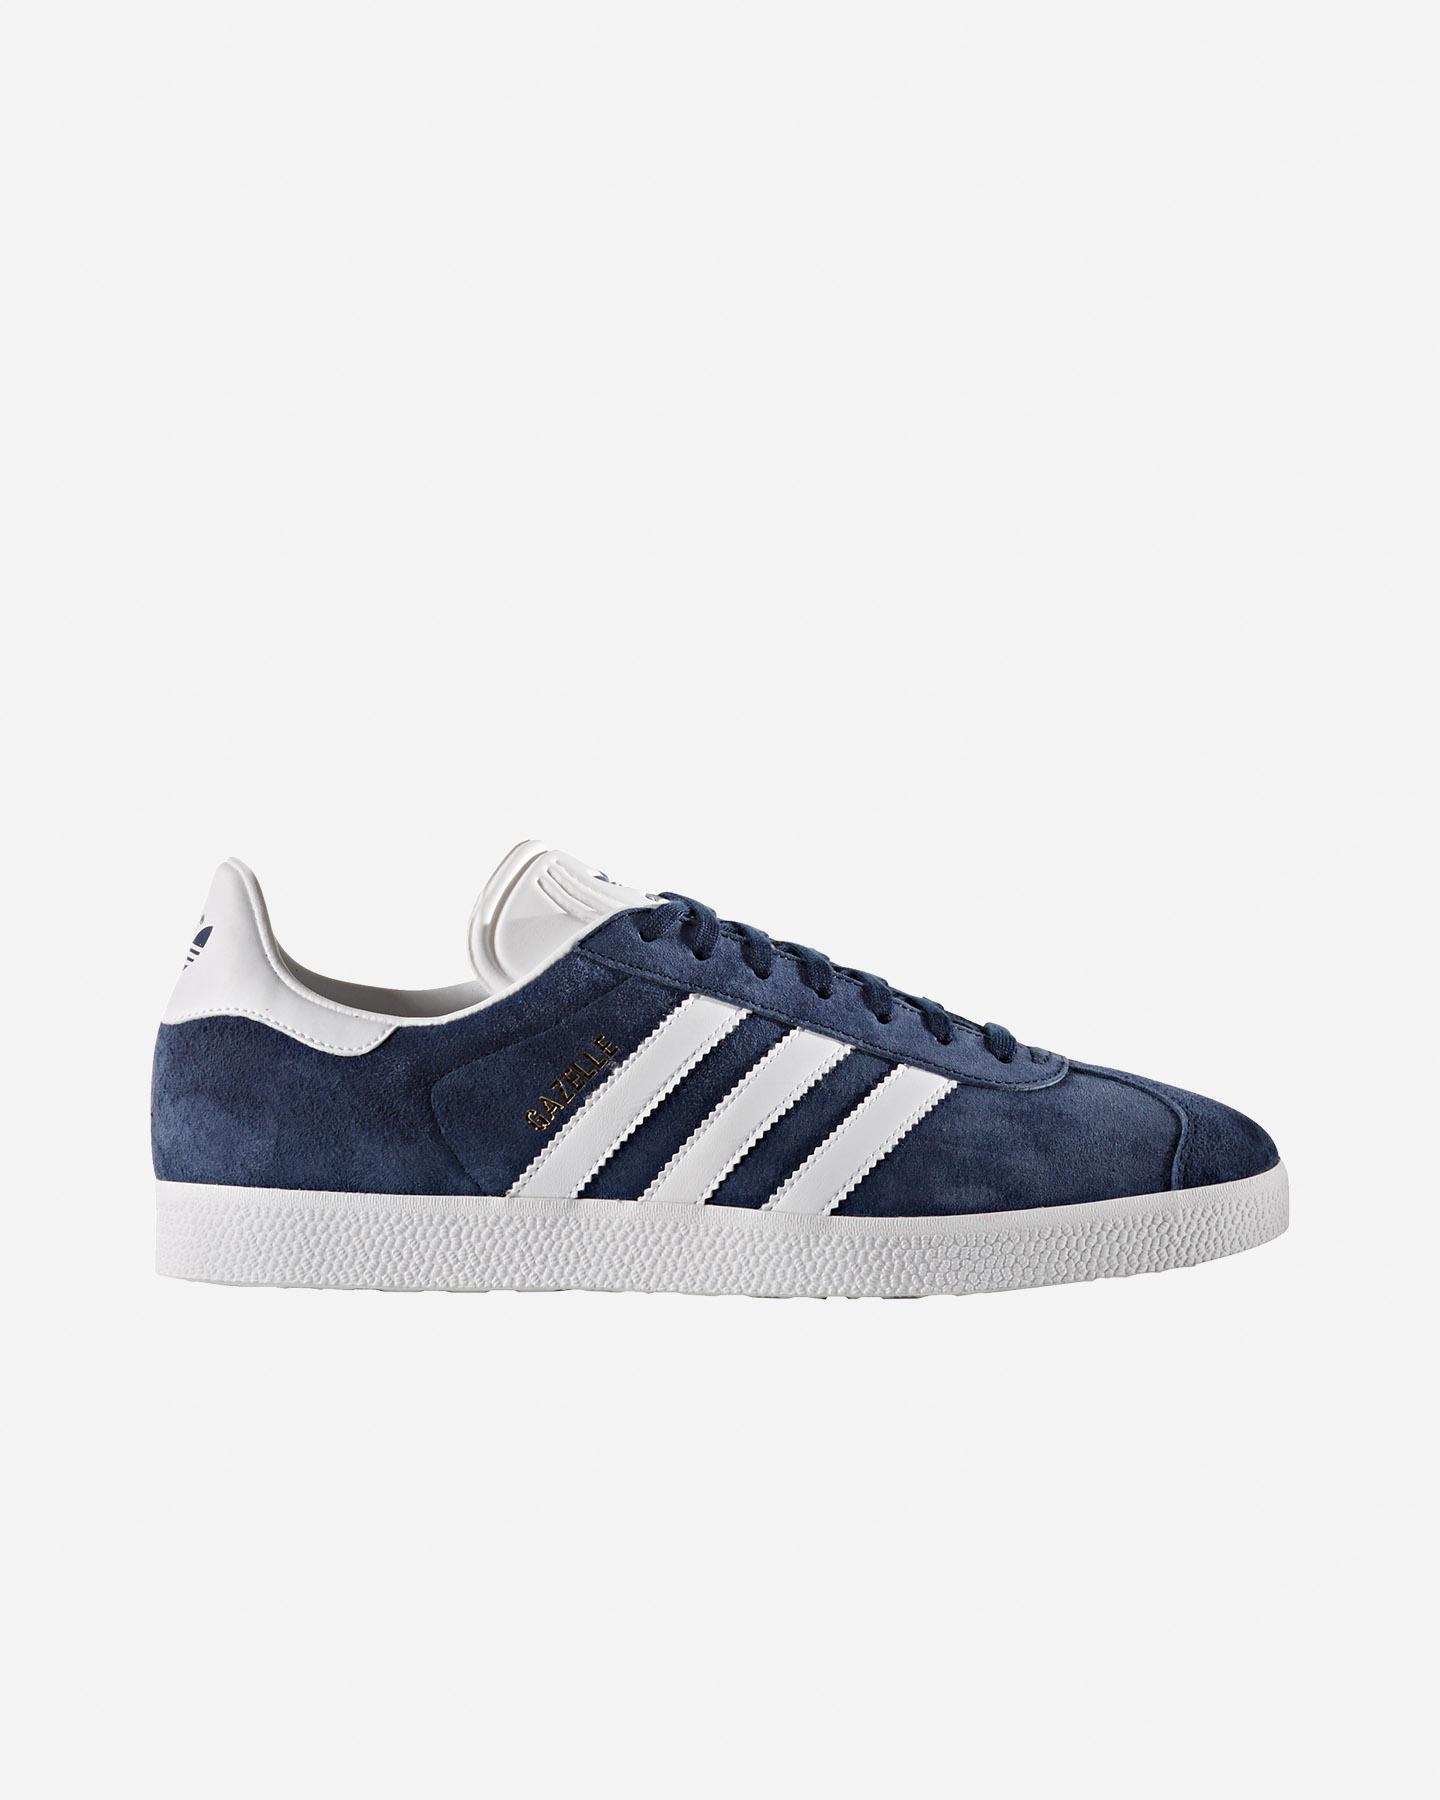 newest c89d9 e0151 Scarpe sneakers ADIDAS GAZELLE ...